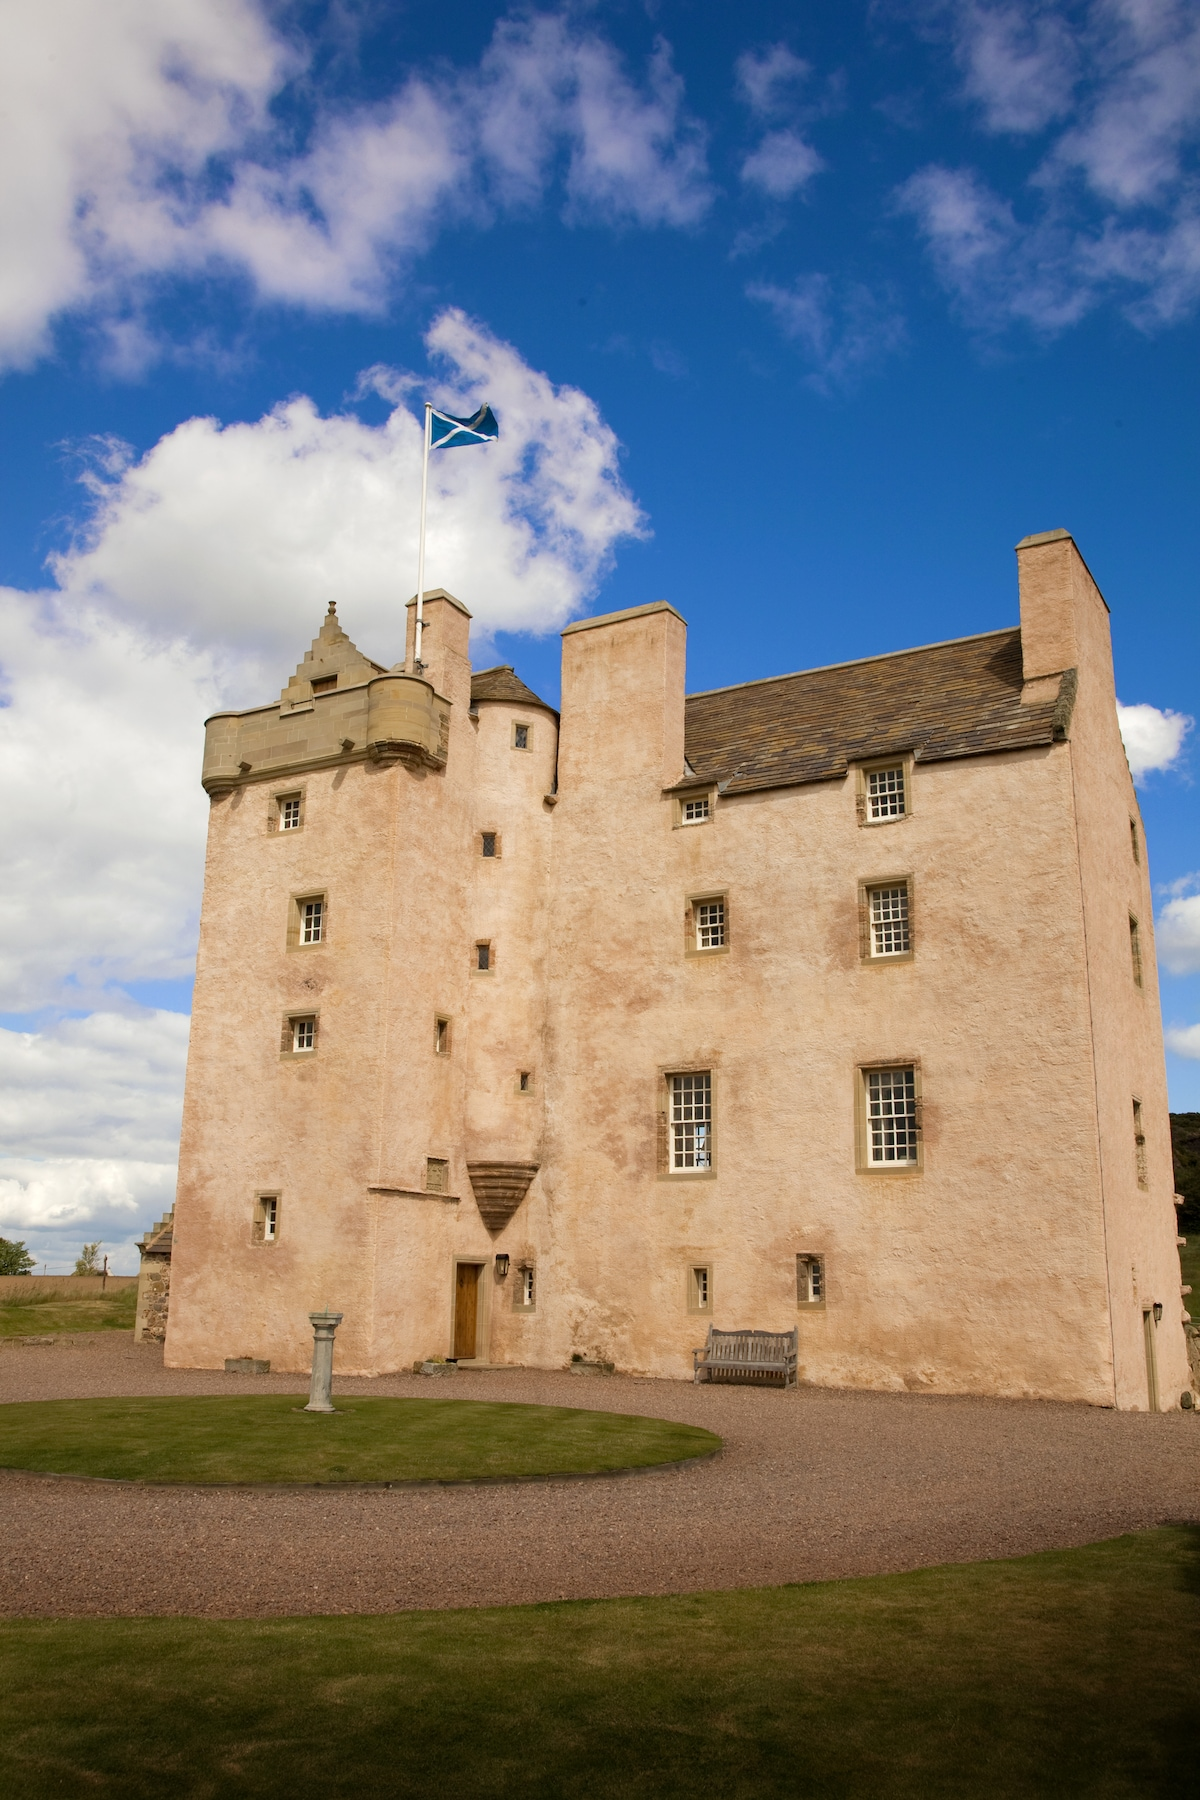 Luxury 16th Century Fenton Tower